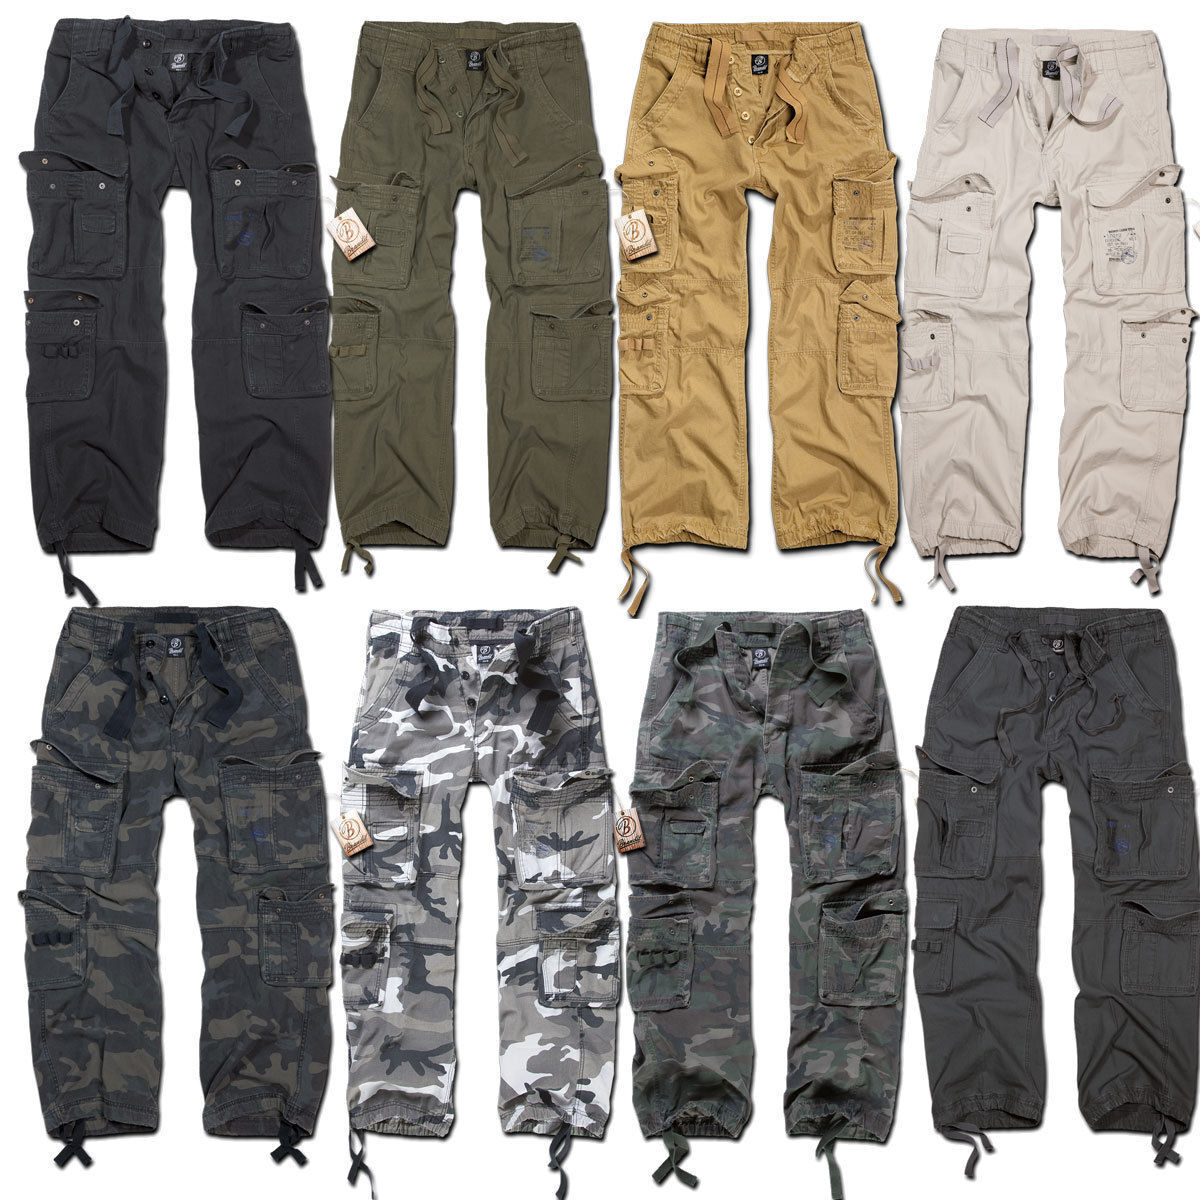 BRANDIT PURE VINTAGE TROUSER alle Farben S-7XL Cargo Airforce Hose Army Pants